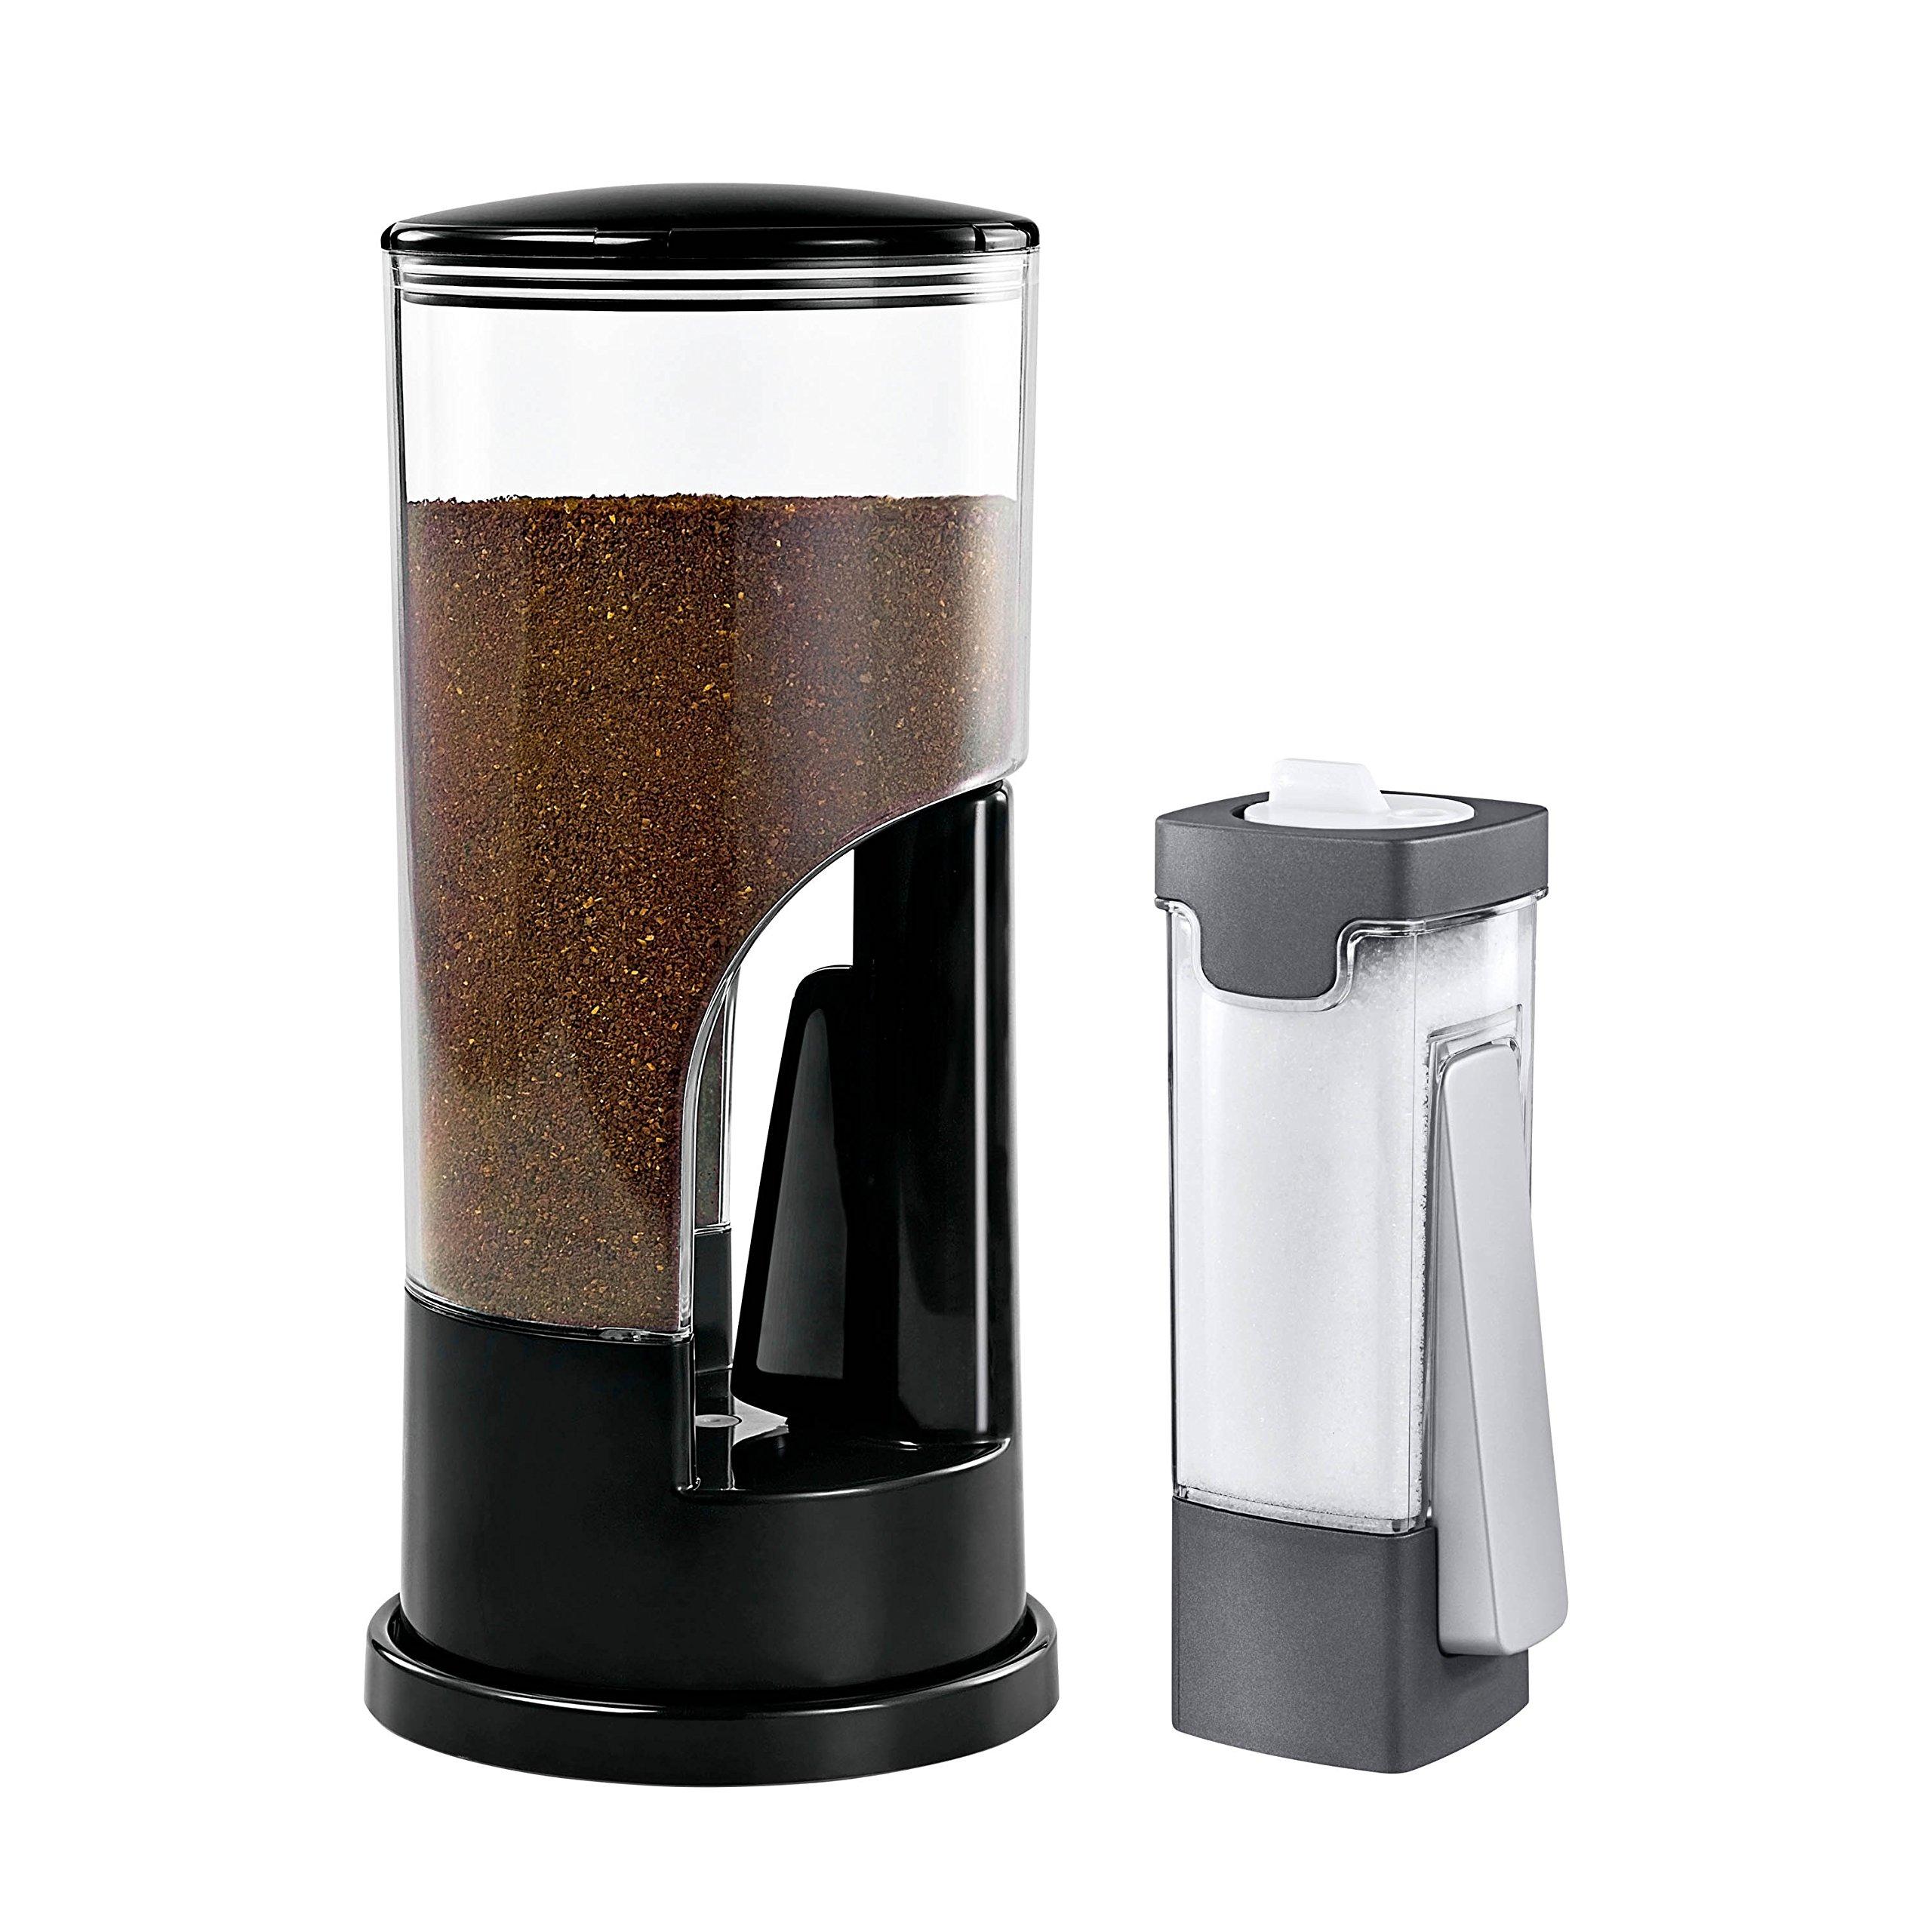 Honey-Can-Do KCHX06080 Coffee Dispenser & Sugar Dispenser Set by Honey-Can-Do